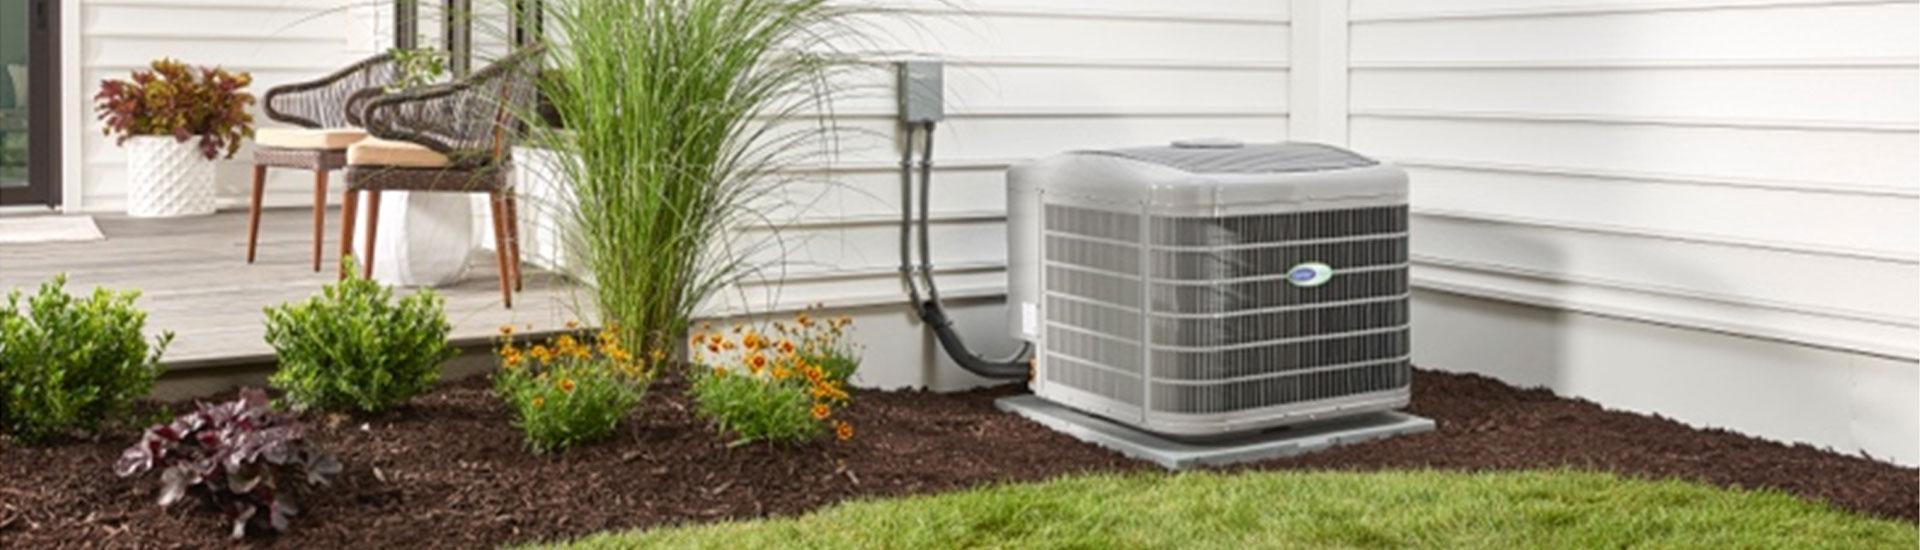 AC Repair in DeWitt, Eaton County, Ingham County, Lansing, and Portland, MI